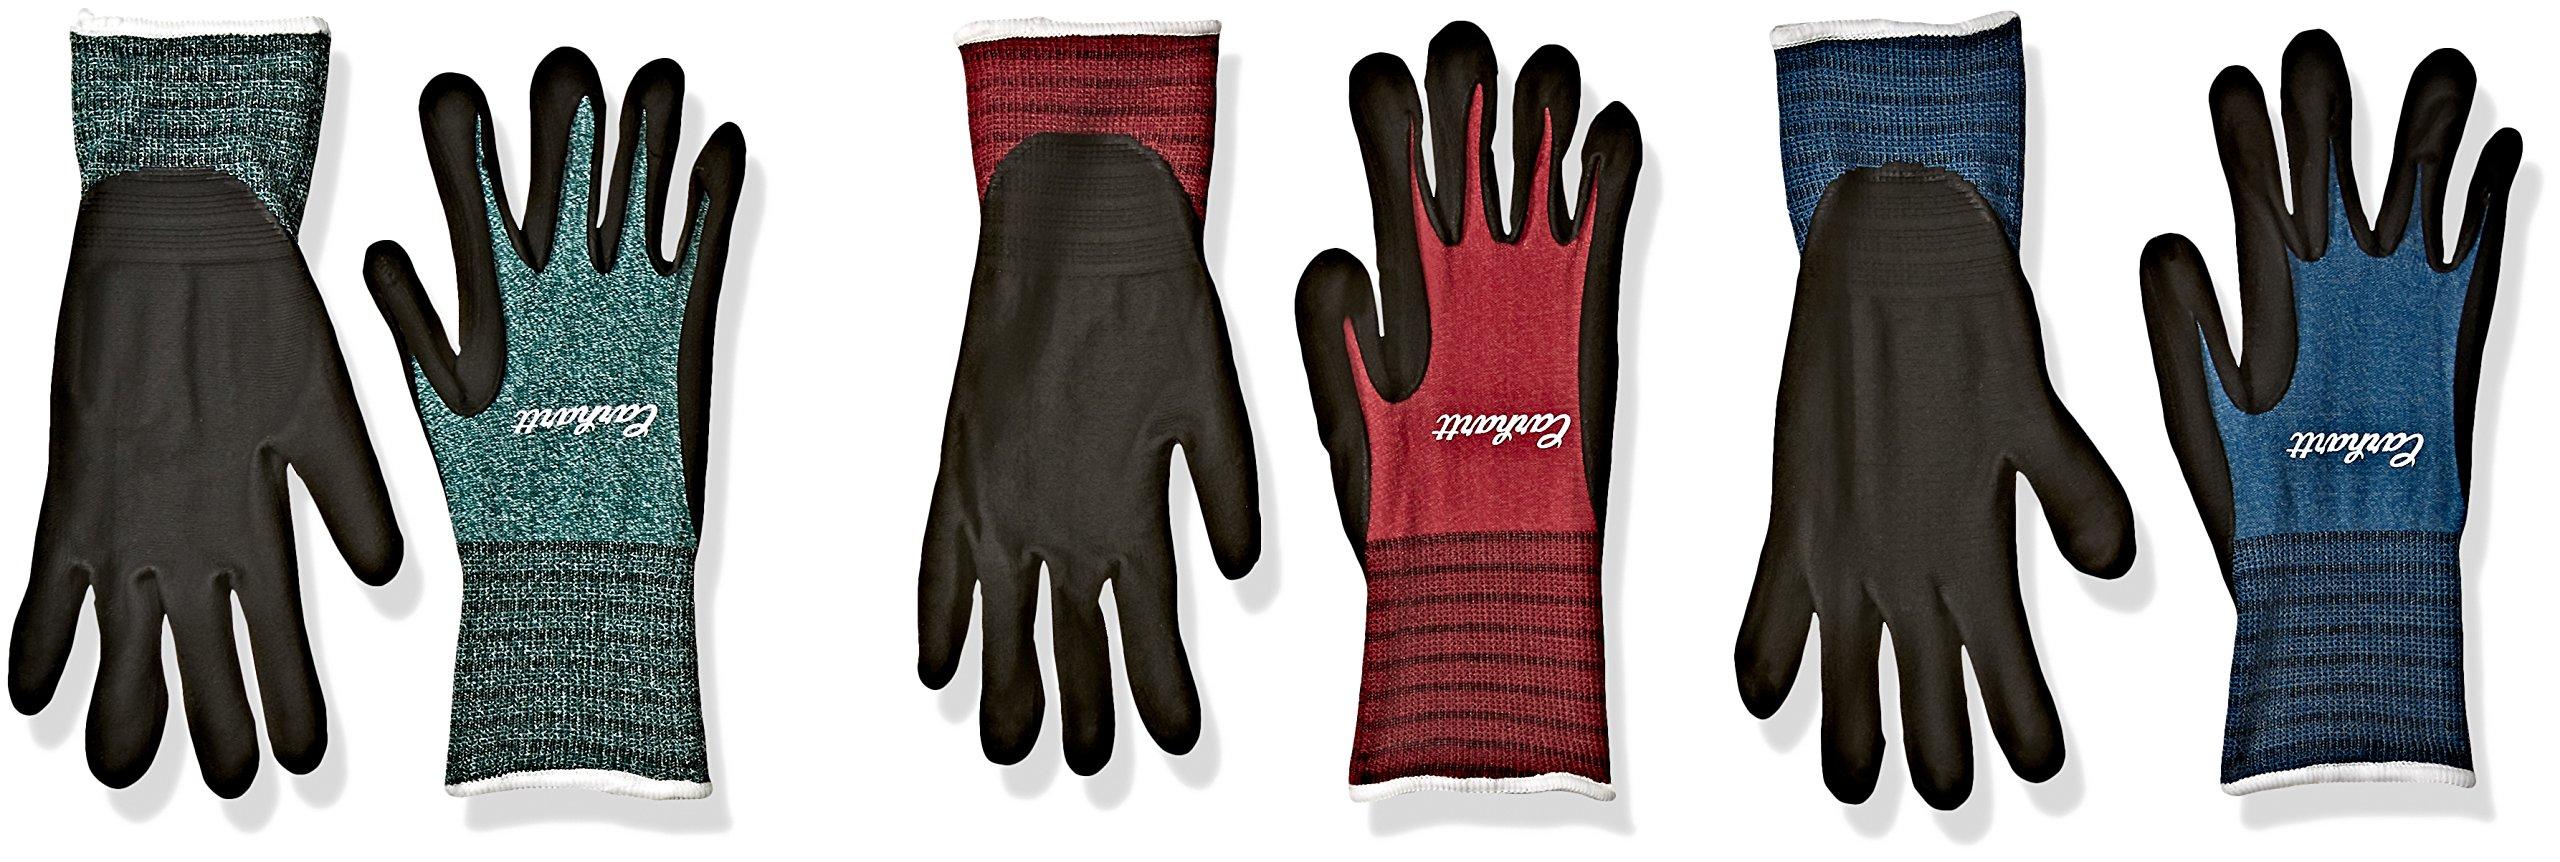 Carhartt Women's All Purpose Nitrile Grip Work Glove (3-Pack), Blue, Emerald, Wild Pink, Medium by Carhartt